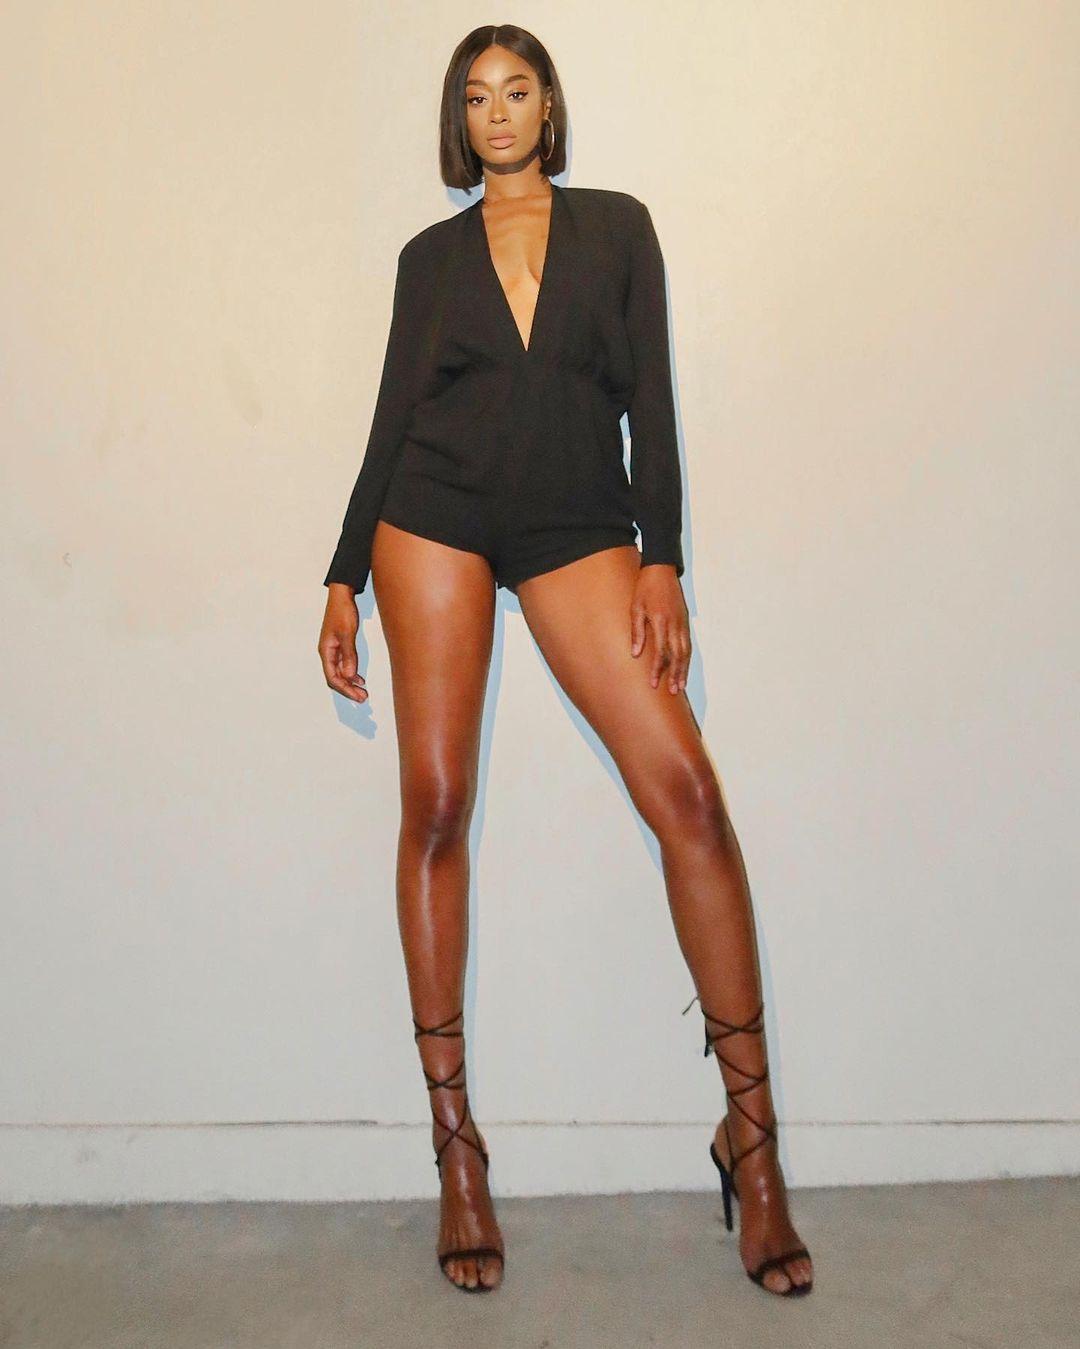 Model Cebrena fascinates with Instagram and Tiktok Photos 2